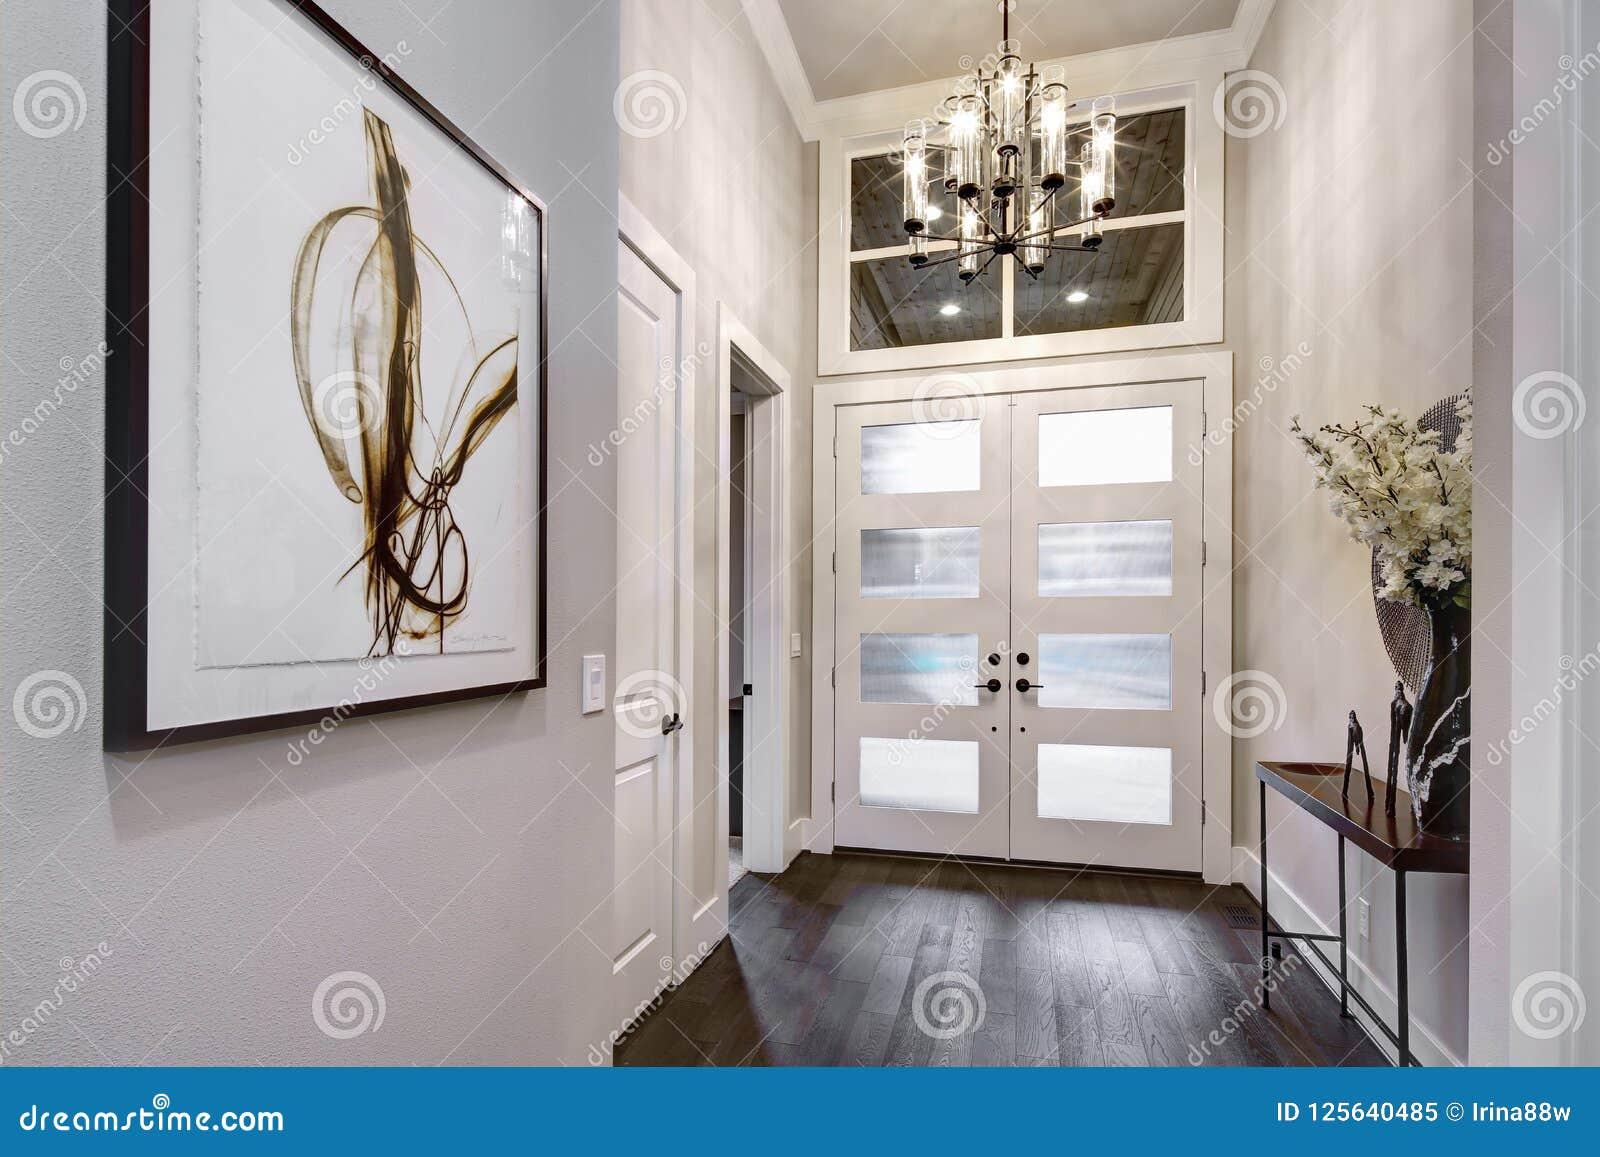 Voordeuringang aan modern huis met hardhoutvloeren